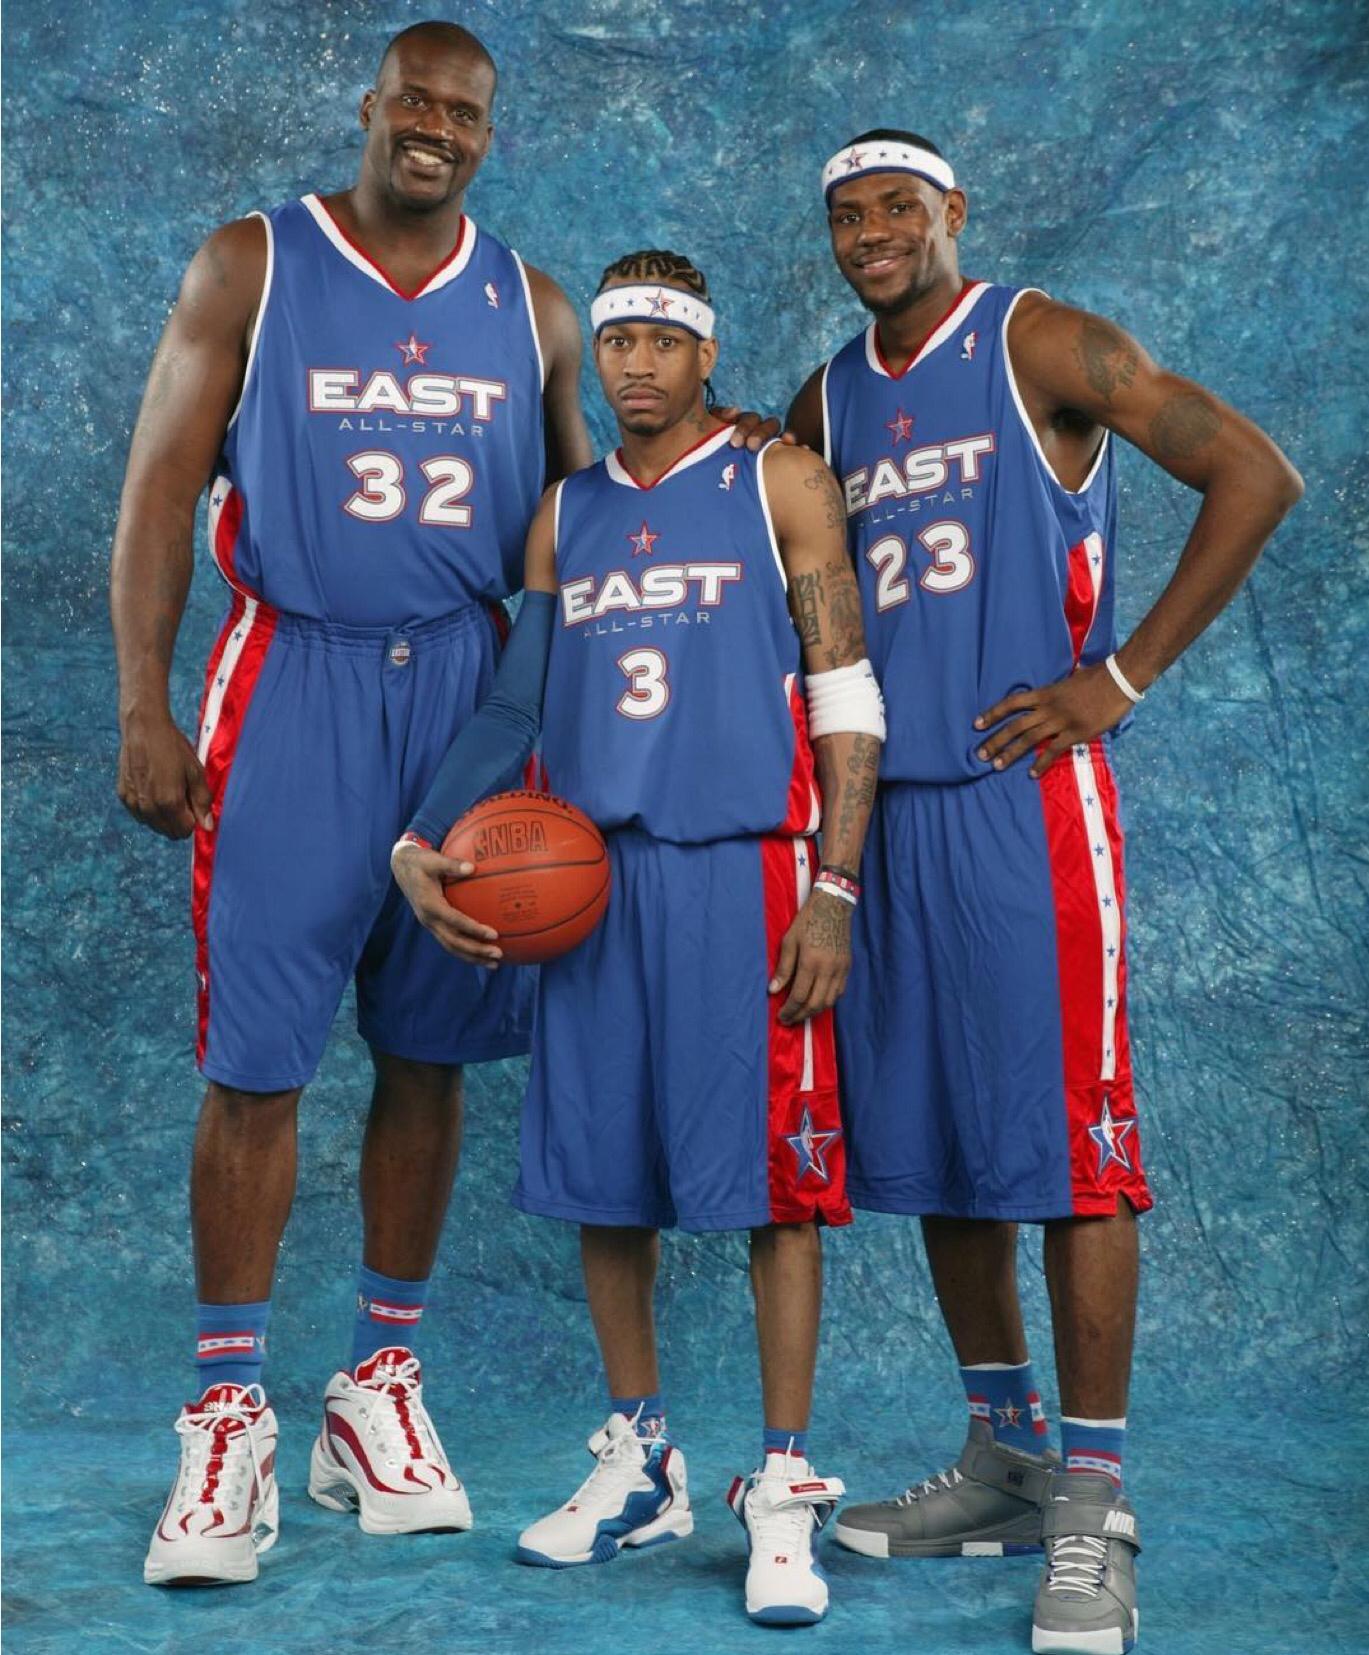 SLAM雜誌曬圖:三個皇帝-Haters-黑特籃球NBA新聞影片圖片分享社區